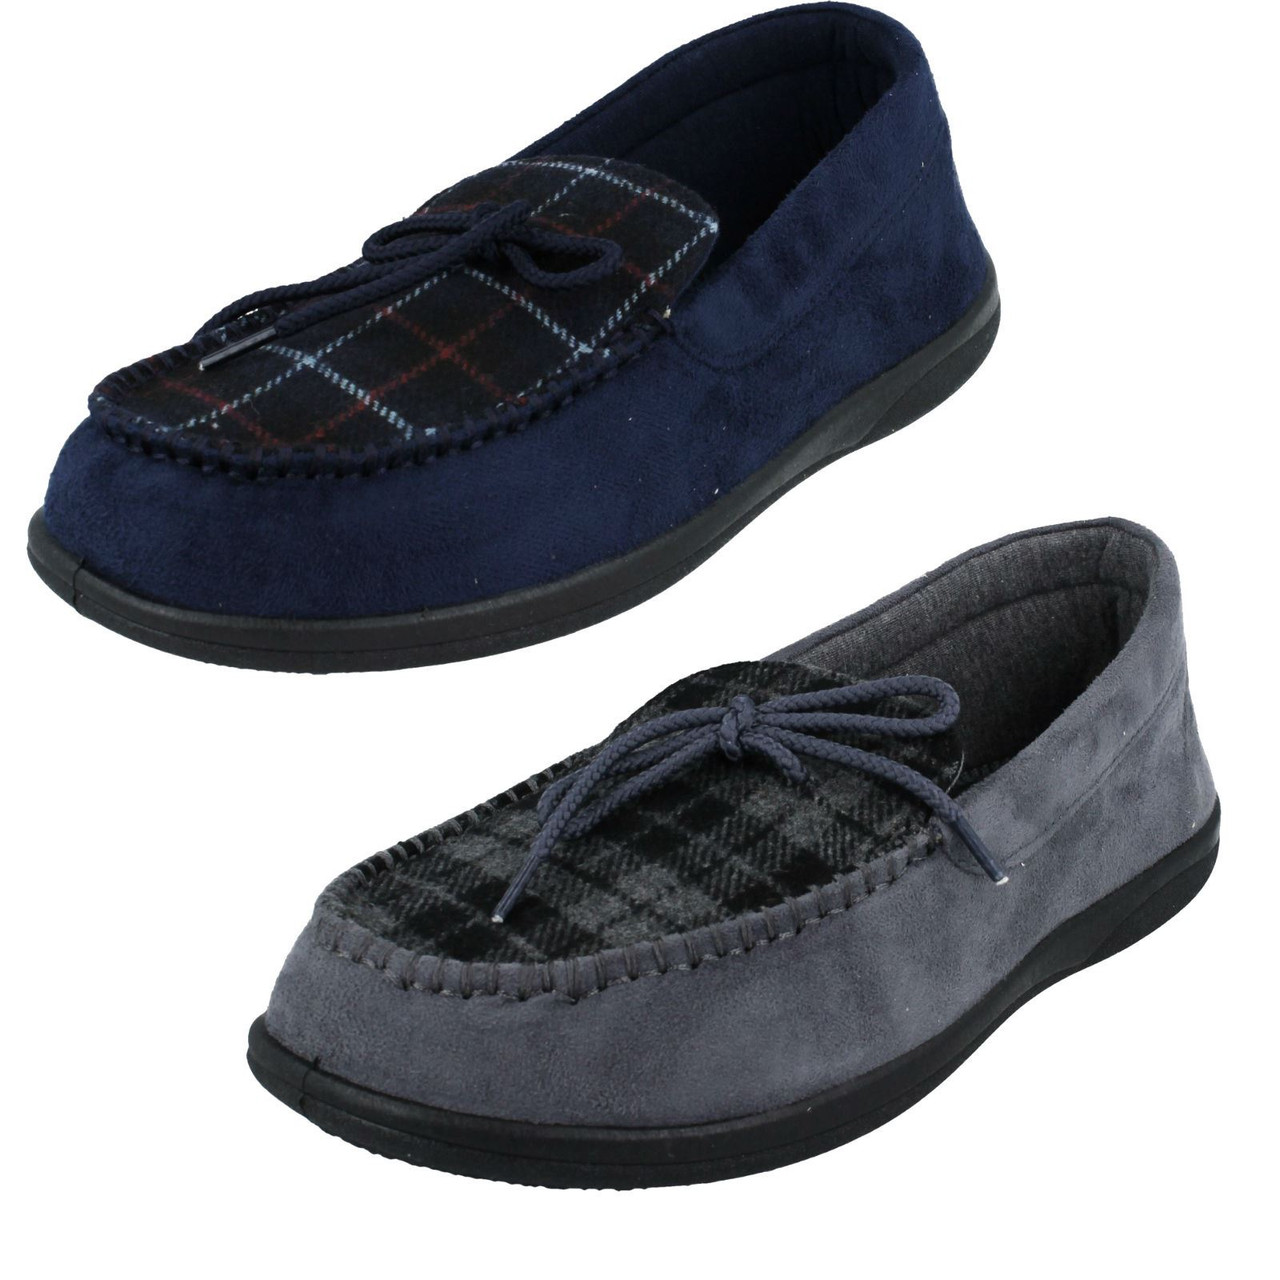 Padders Mens Black Wide Fit Memory Foam Slipper Sizes 6,7,8,9,10,11,12